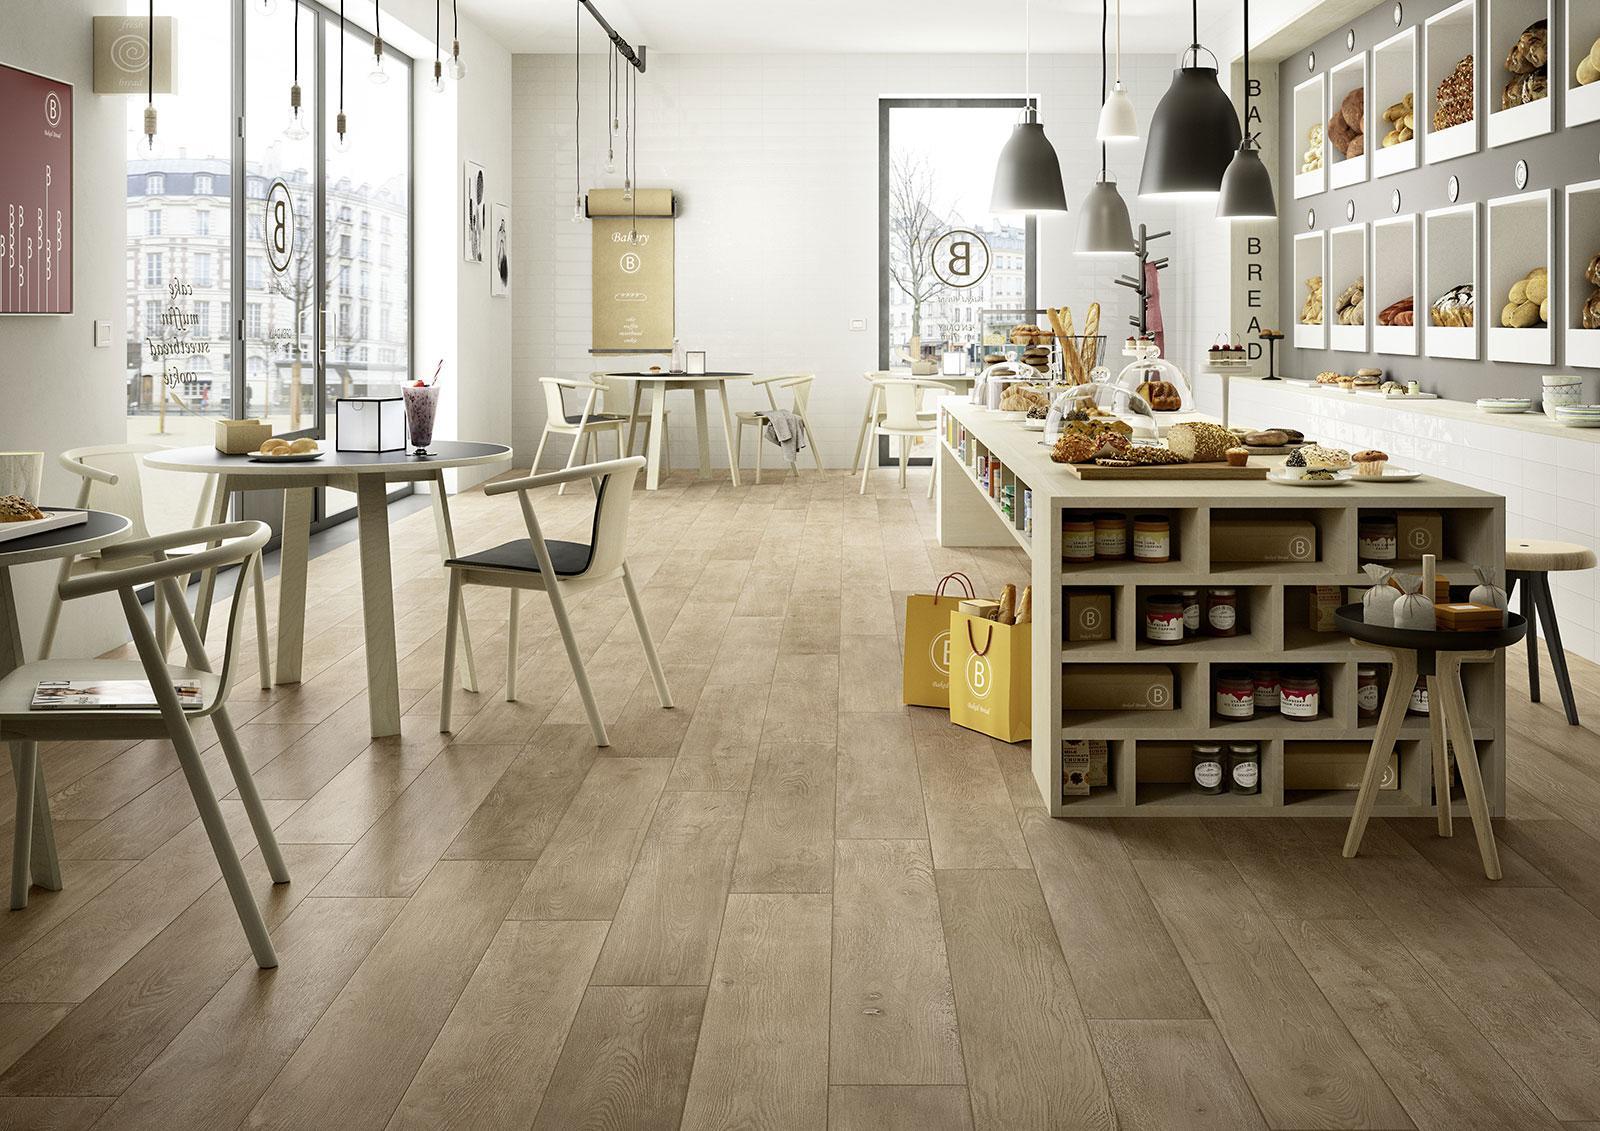 treverktime efecto madera - Suelos Ceramicos Imitacion Madera